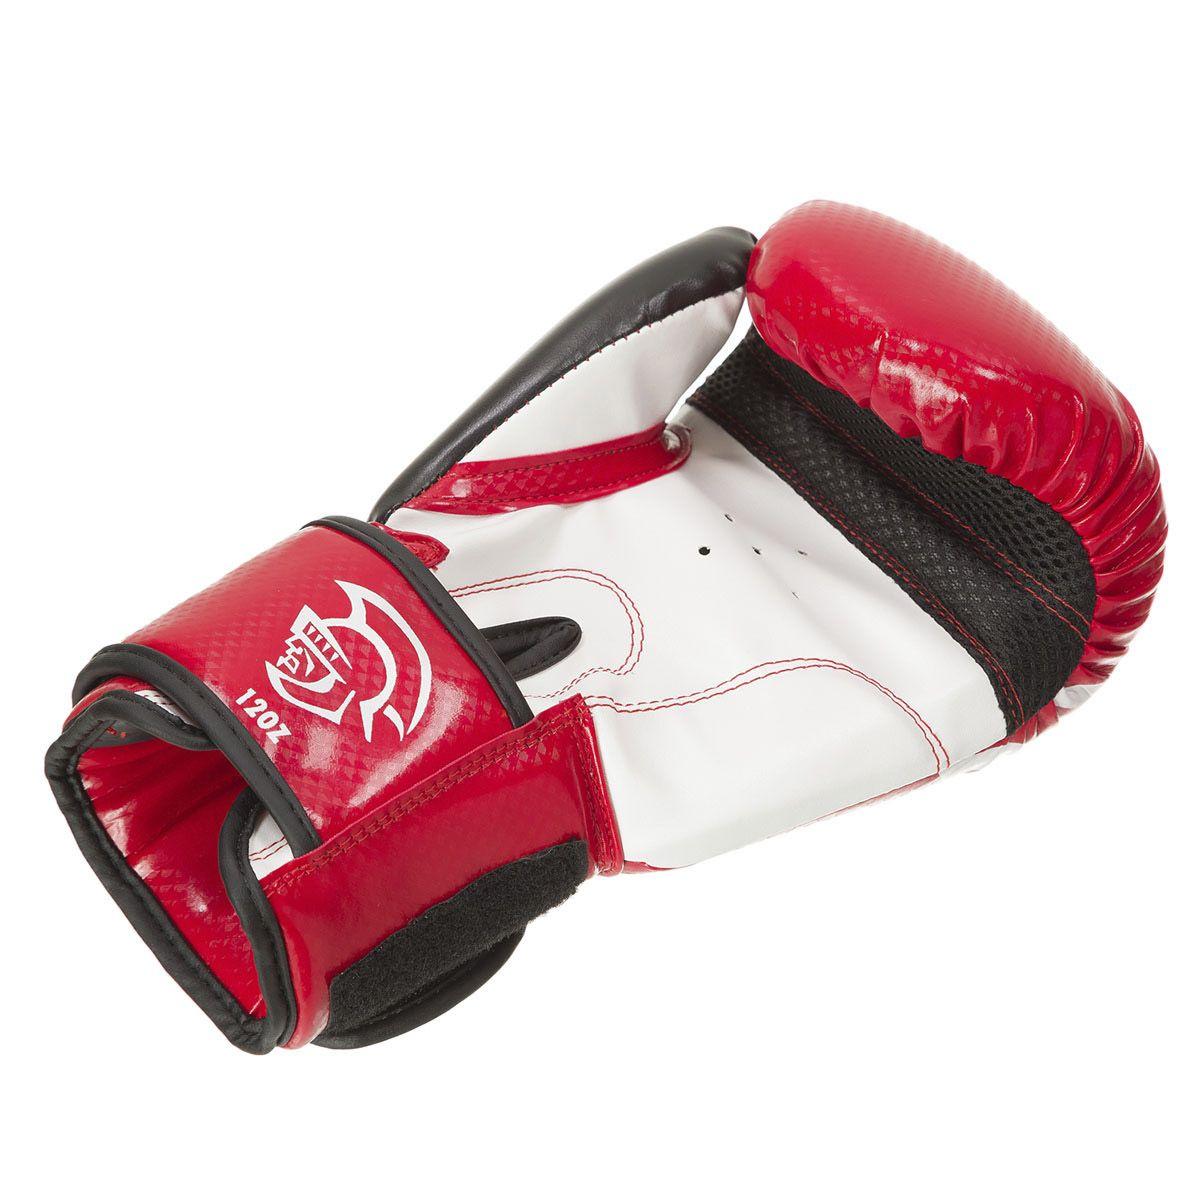 Luvas Boxe / Muay Thai - Elite Training - Verm/Preto- Pretorian - 10/12/14/16 OZ  - Loja do Competidor